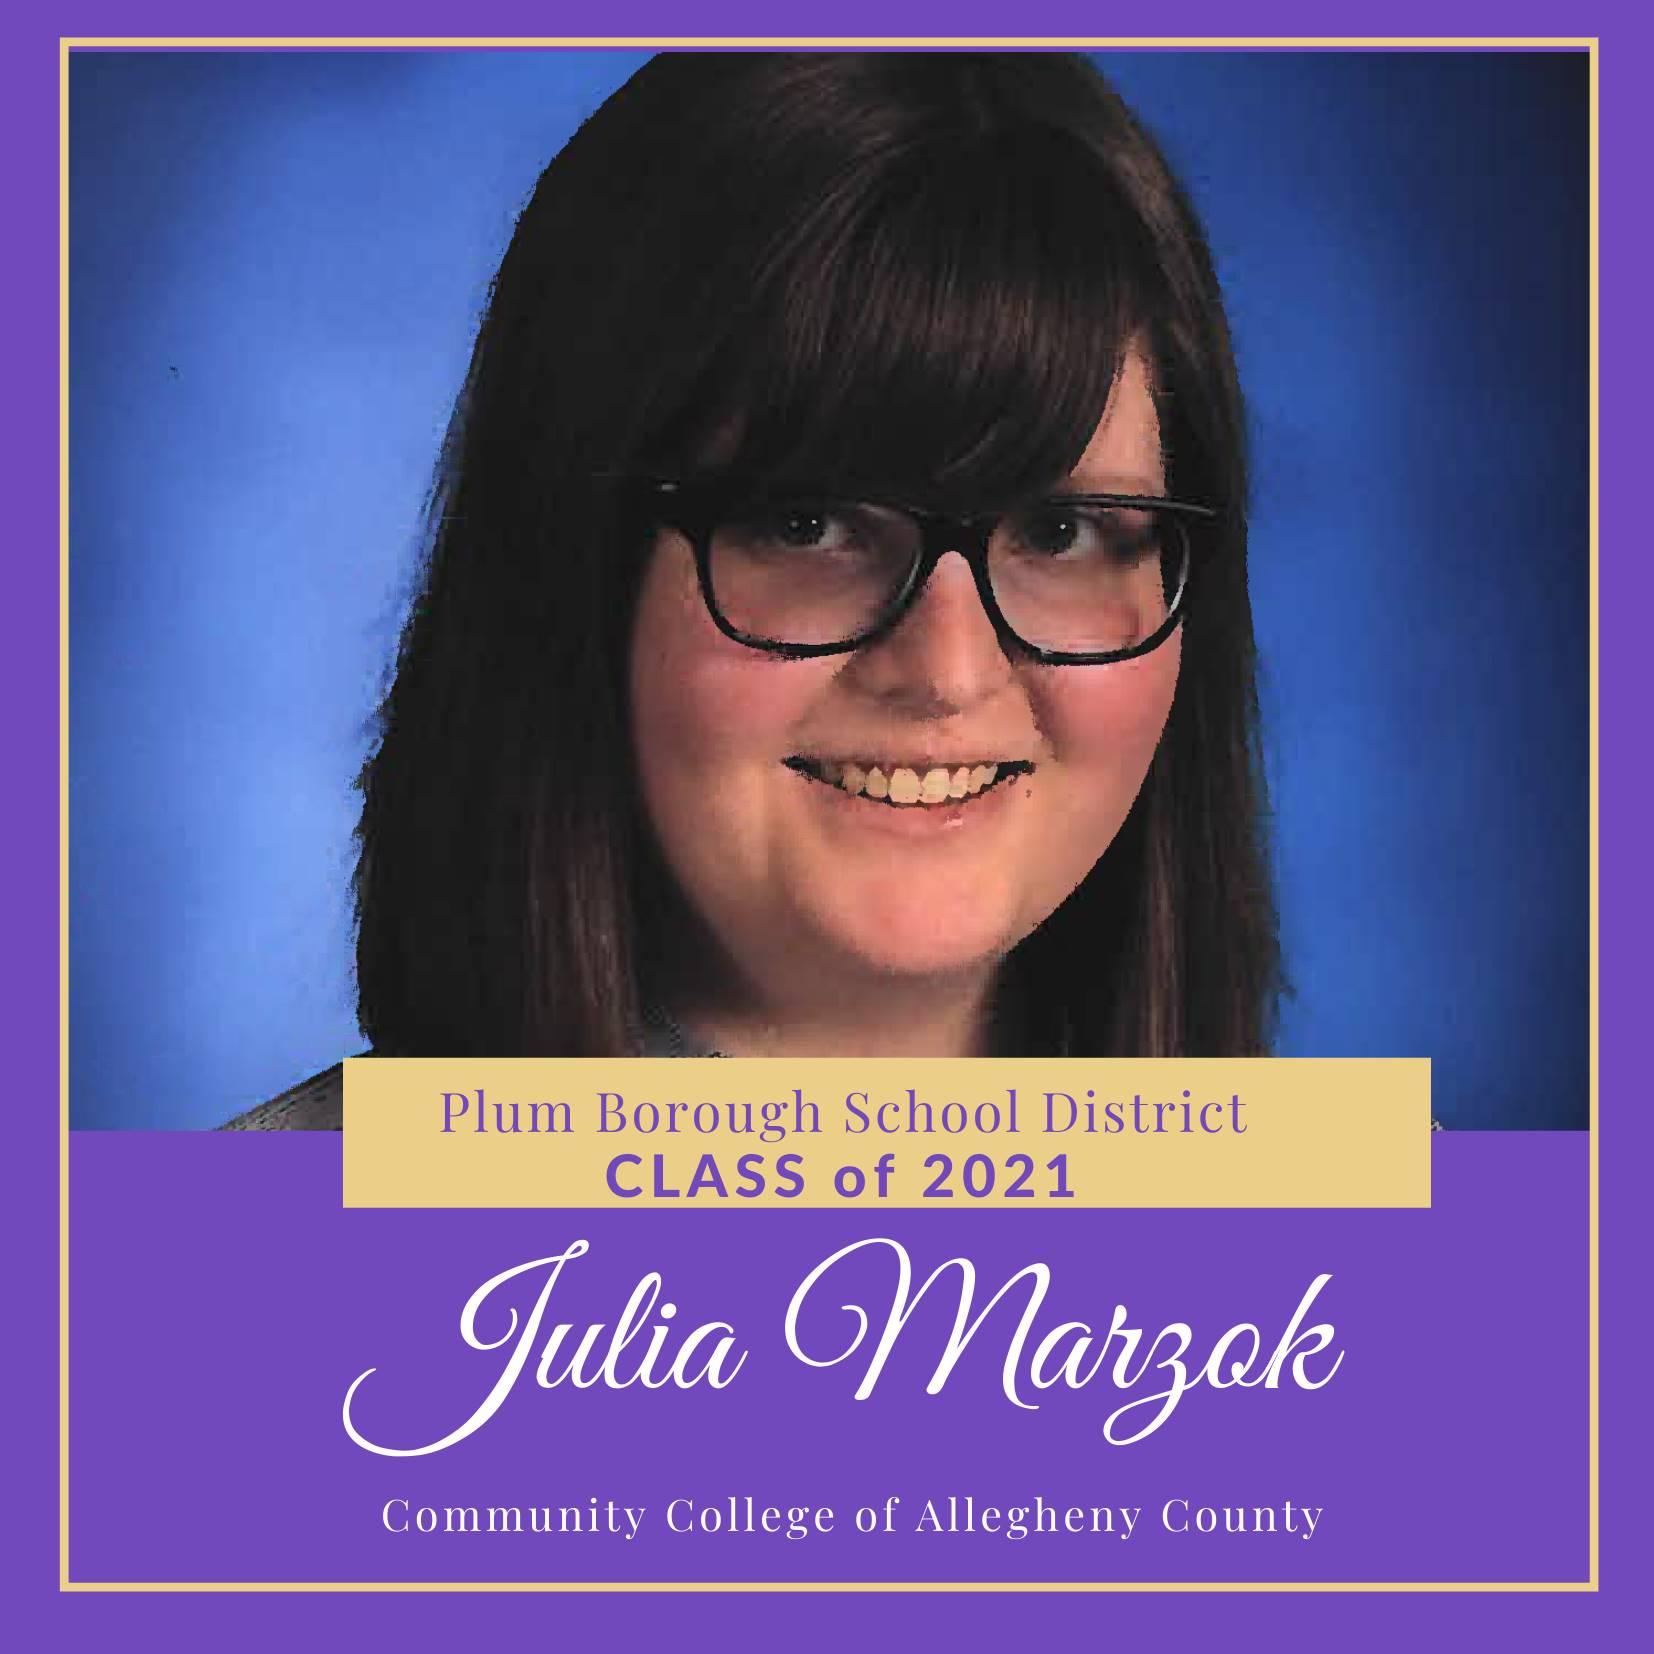 Congratulations to Julia Marzok, Class of 2021!